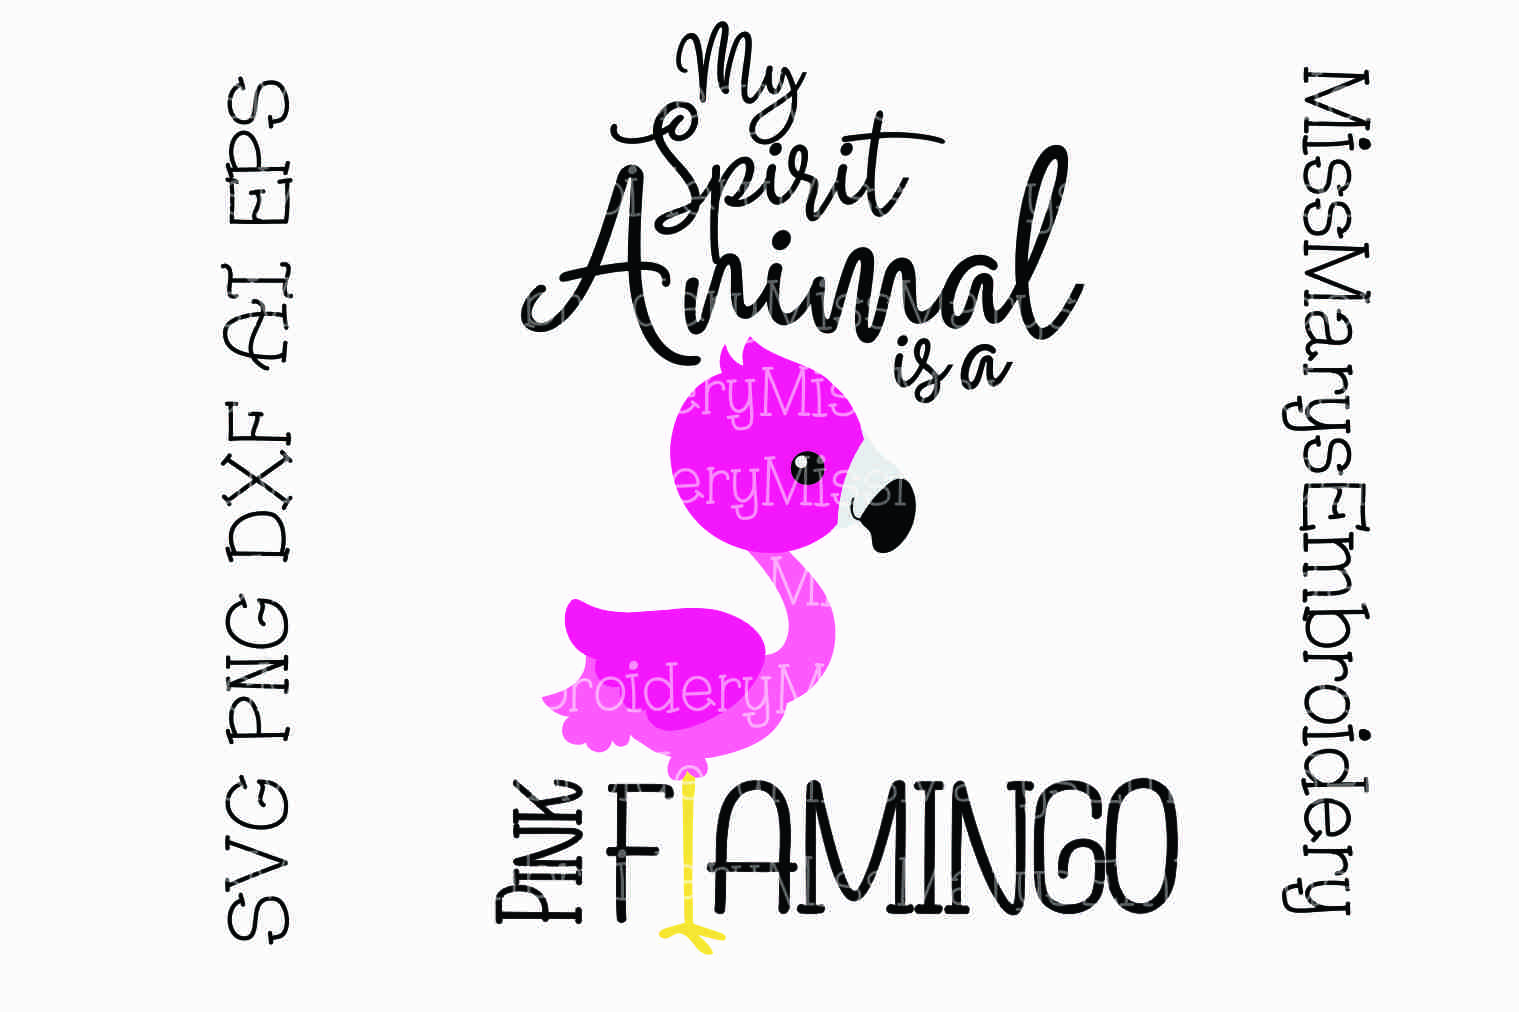 Flamingo Spirit Animal Svg Cutting File Png Dxf Ai Eps 90332 Cut Files Design Bundles